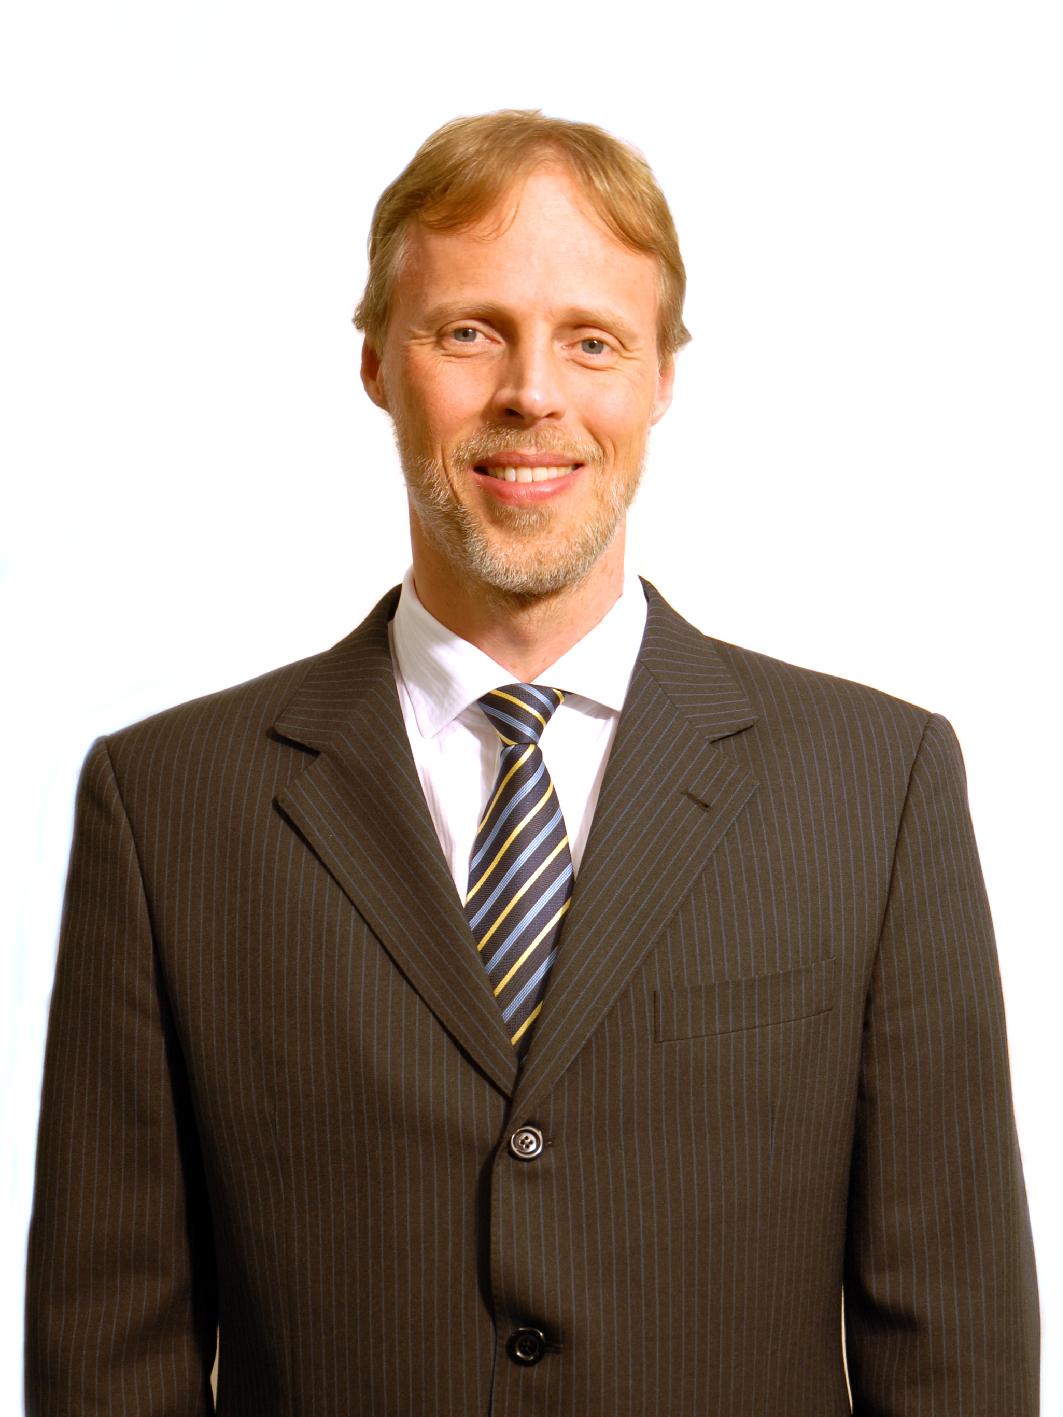 District Labour Court Judge Giovanni Olsson - 12rd Regional Court - Advisory Board